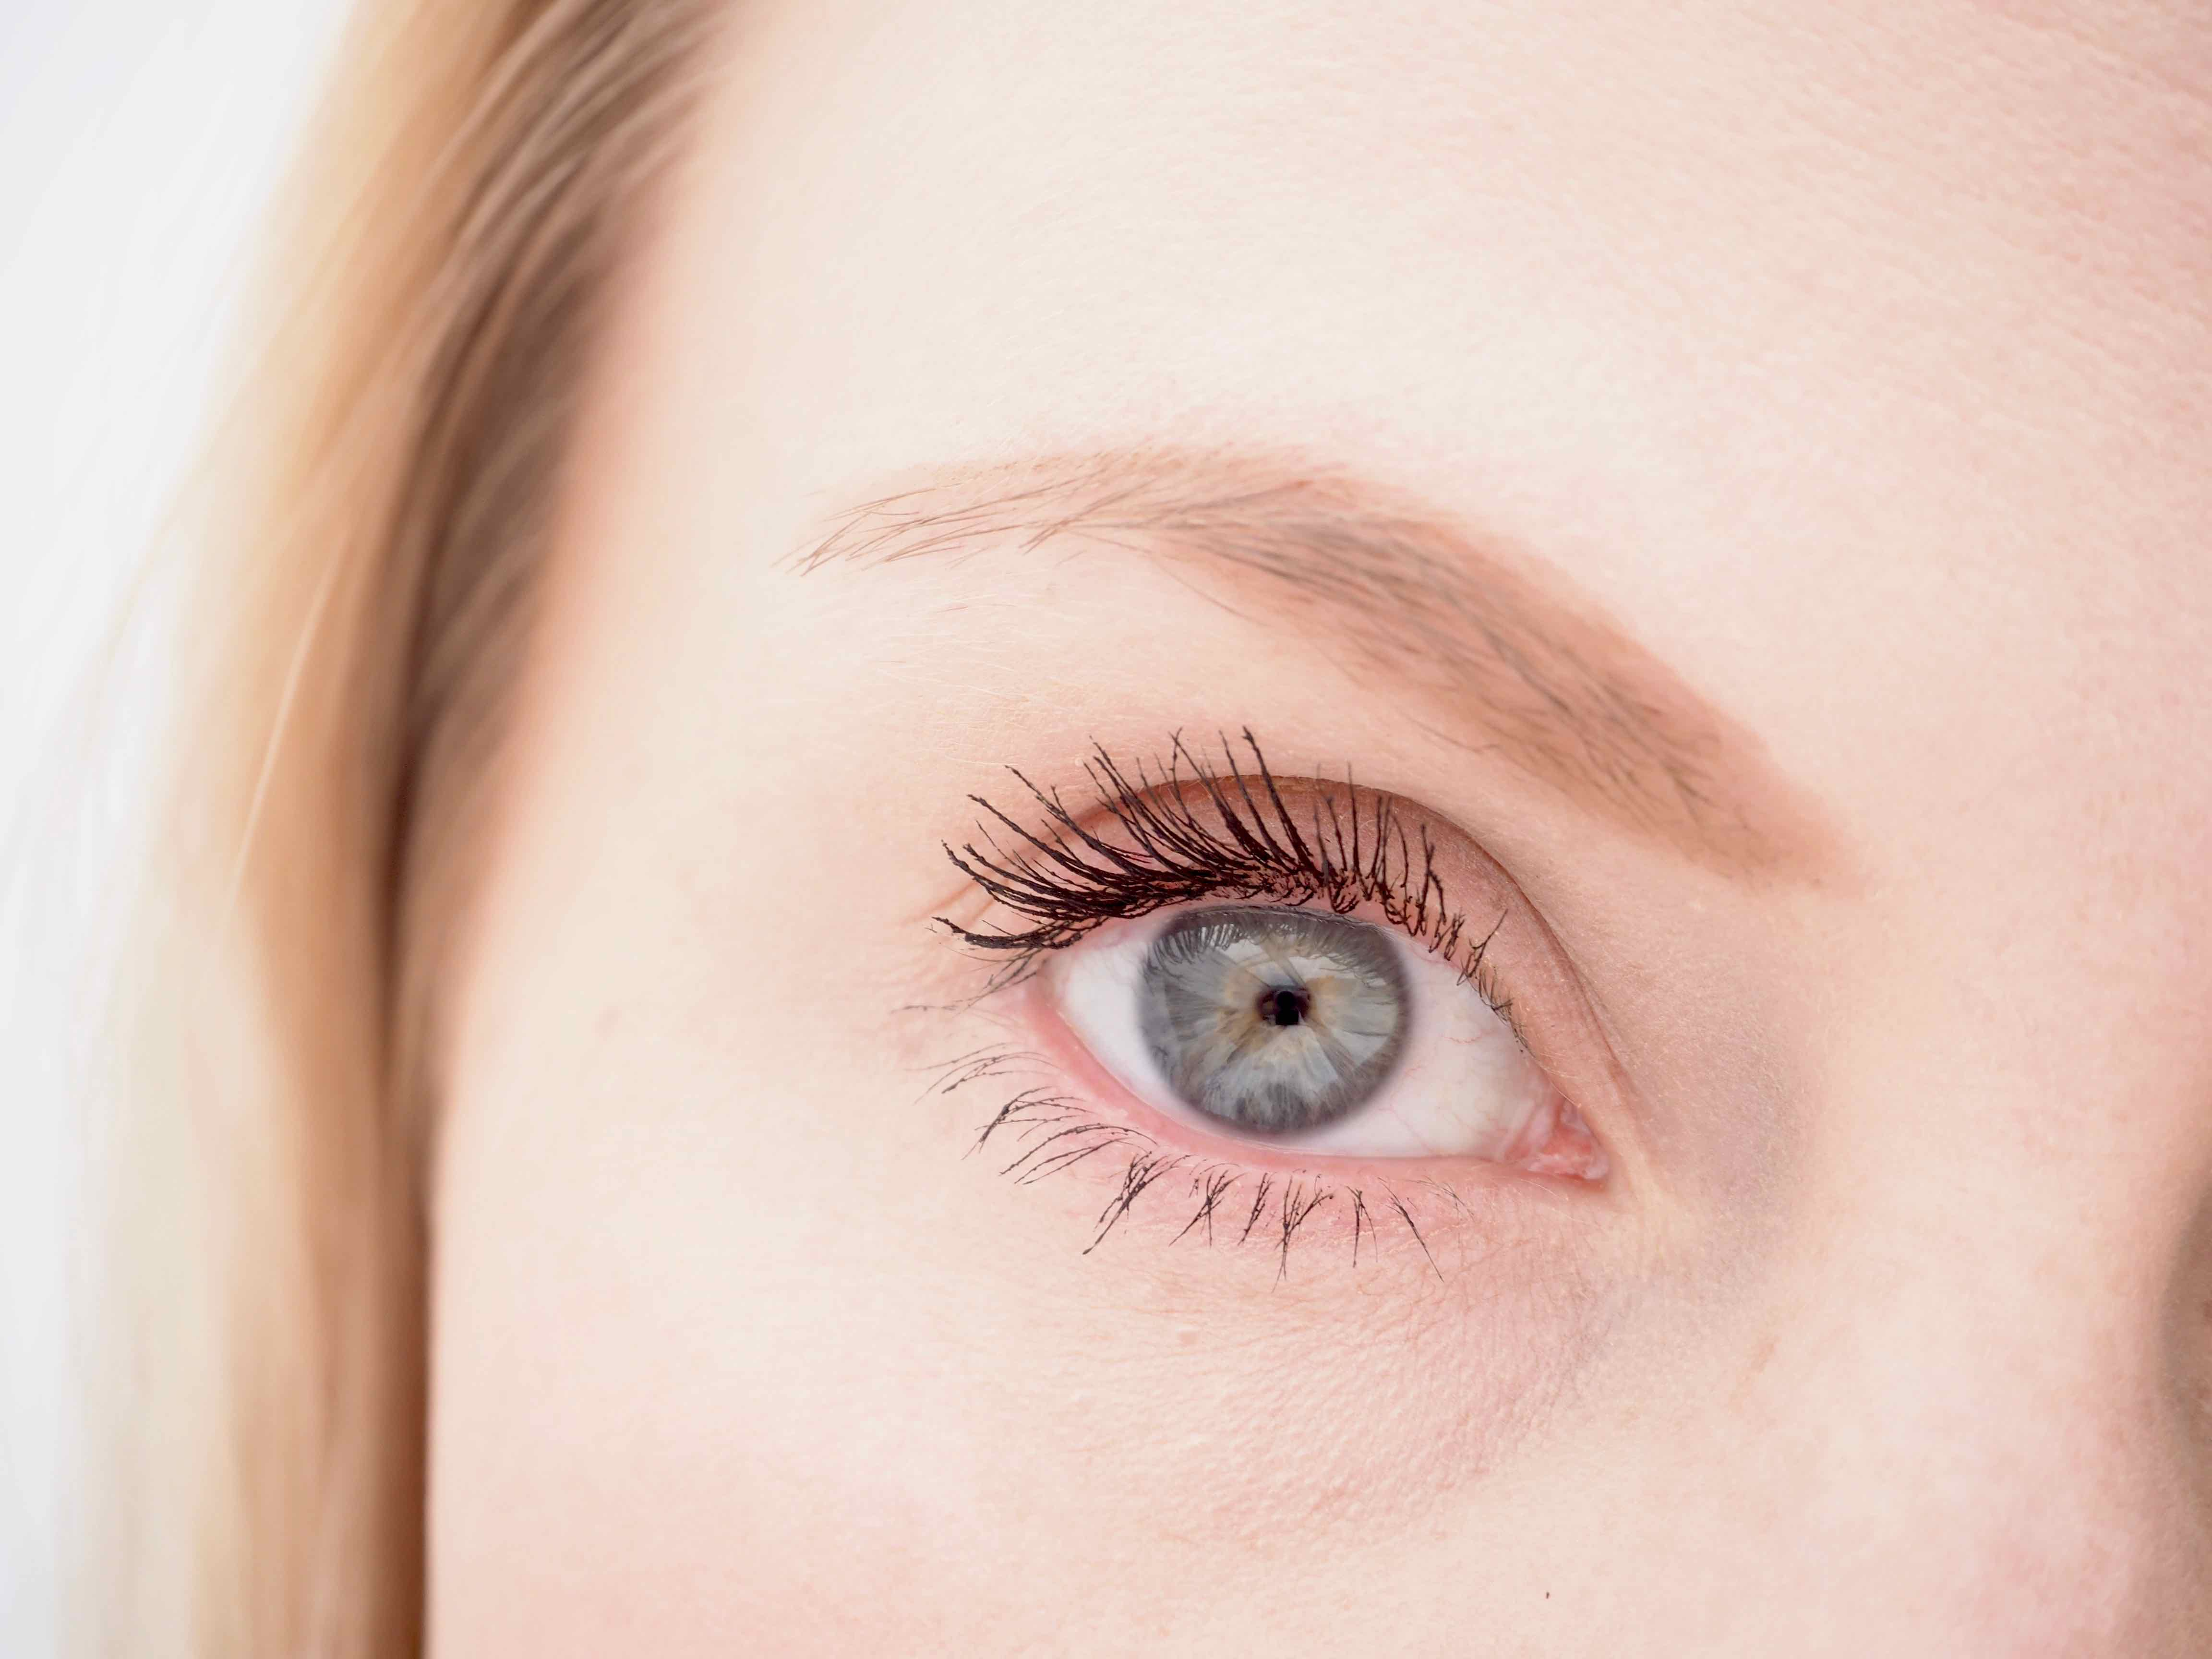 ec30edee17b L'Oréal False Lash Superstar -kaksipäinen ripsiväri | Ostolakossa